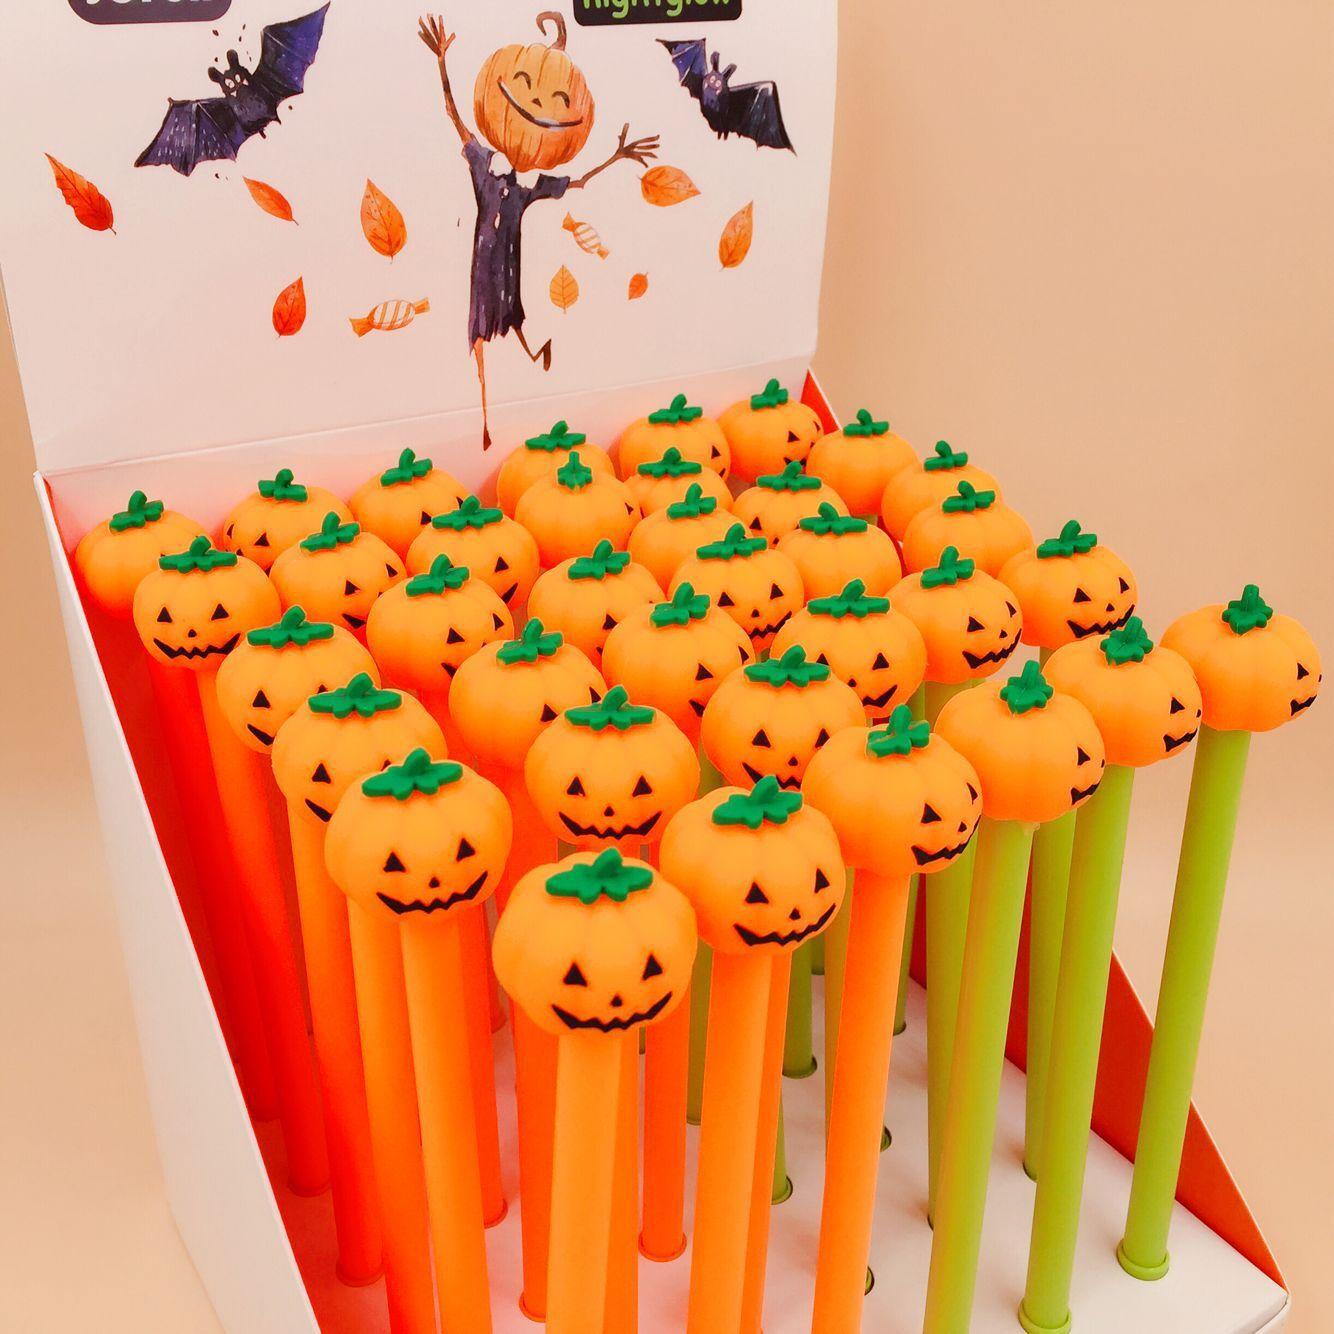 2 Pcs/lot Halloween Pumpkin Gel Pen Signature Pen Escolar Papelaria School Office Supply Promotional Gift